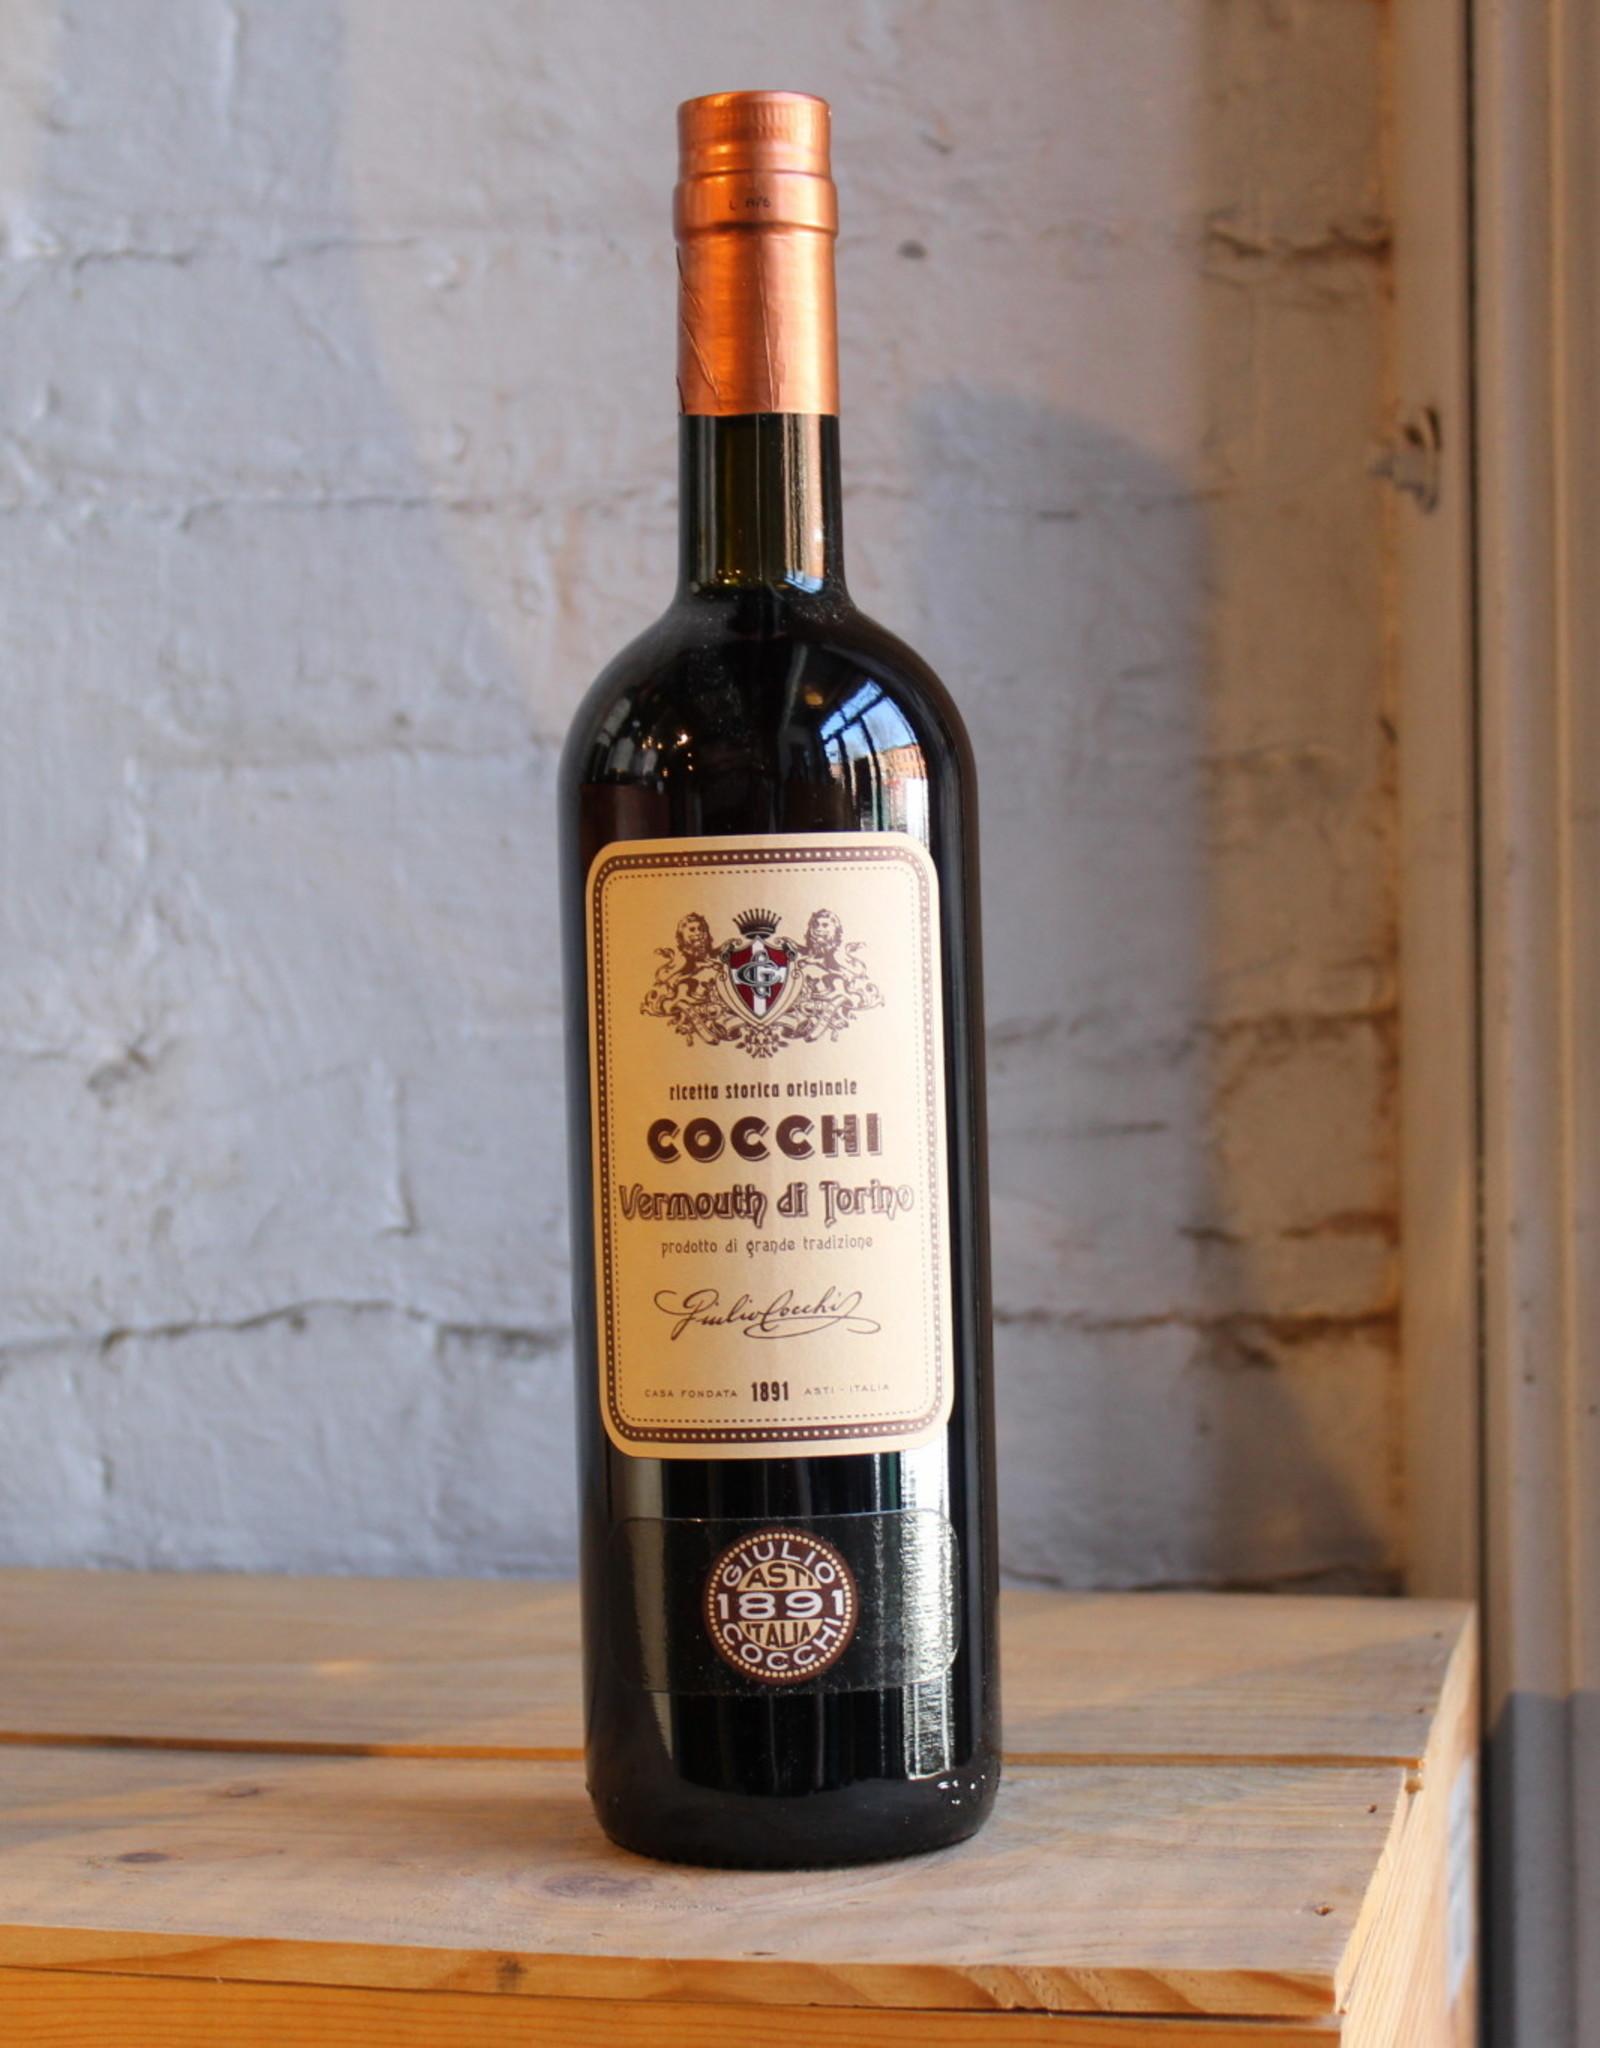 Cocchi Vermouth di Torino - Piedmont, Italy (750ml)